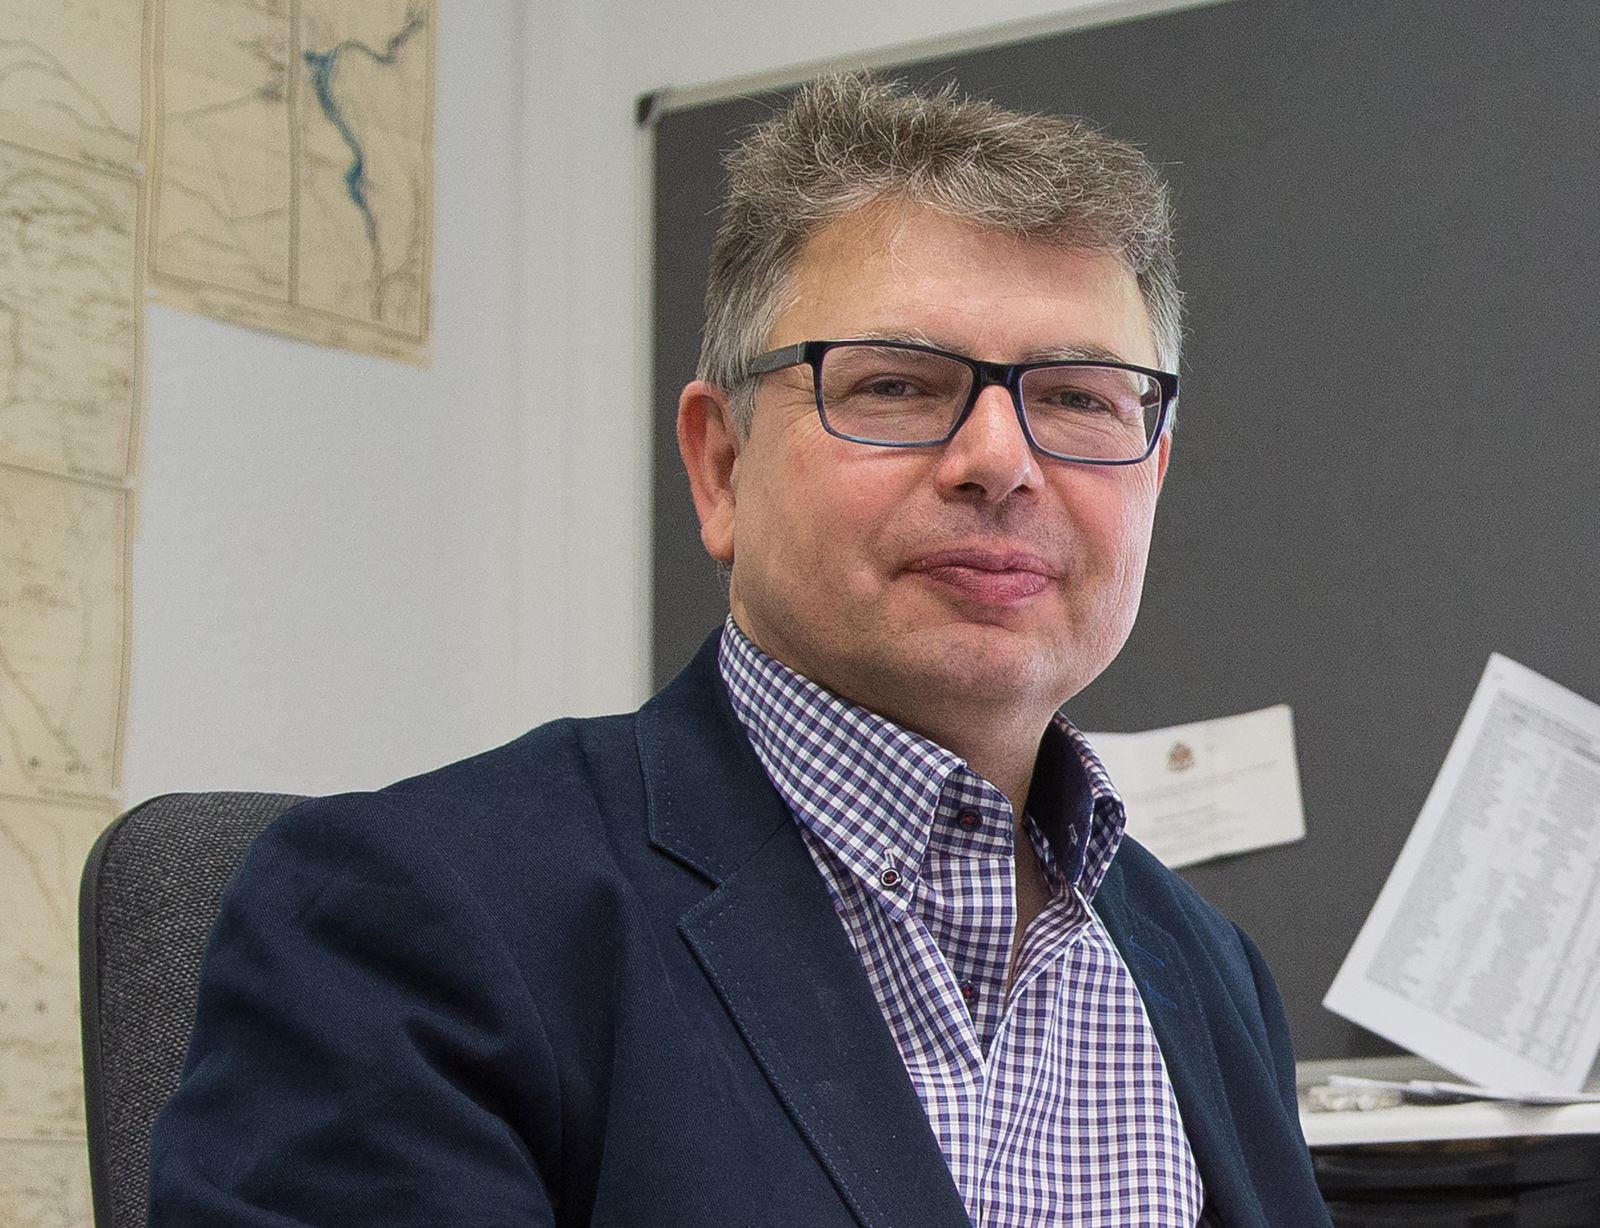 Jurgen Zimmerer